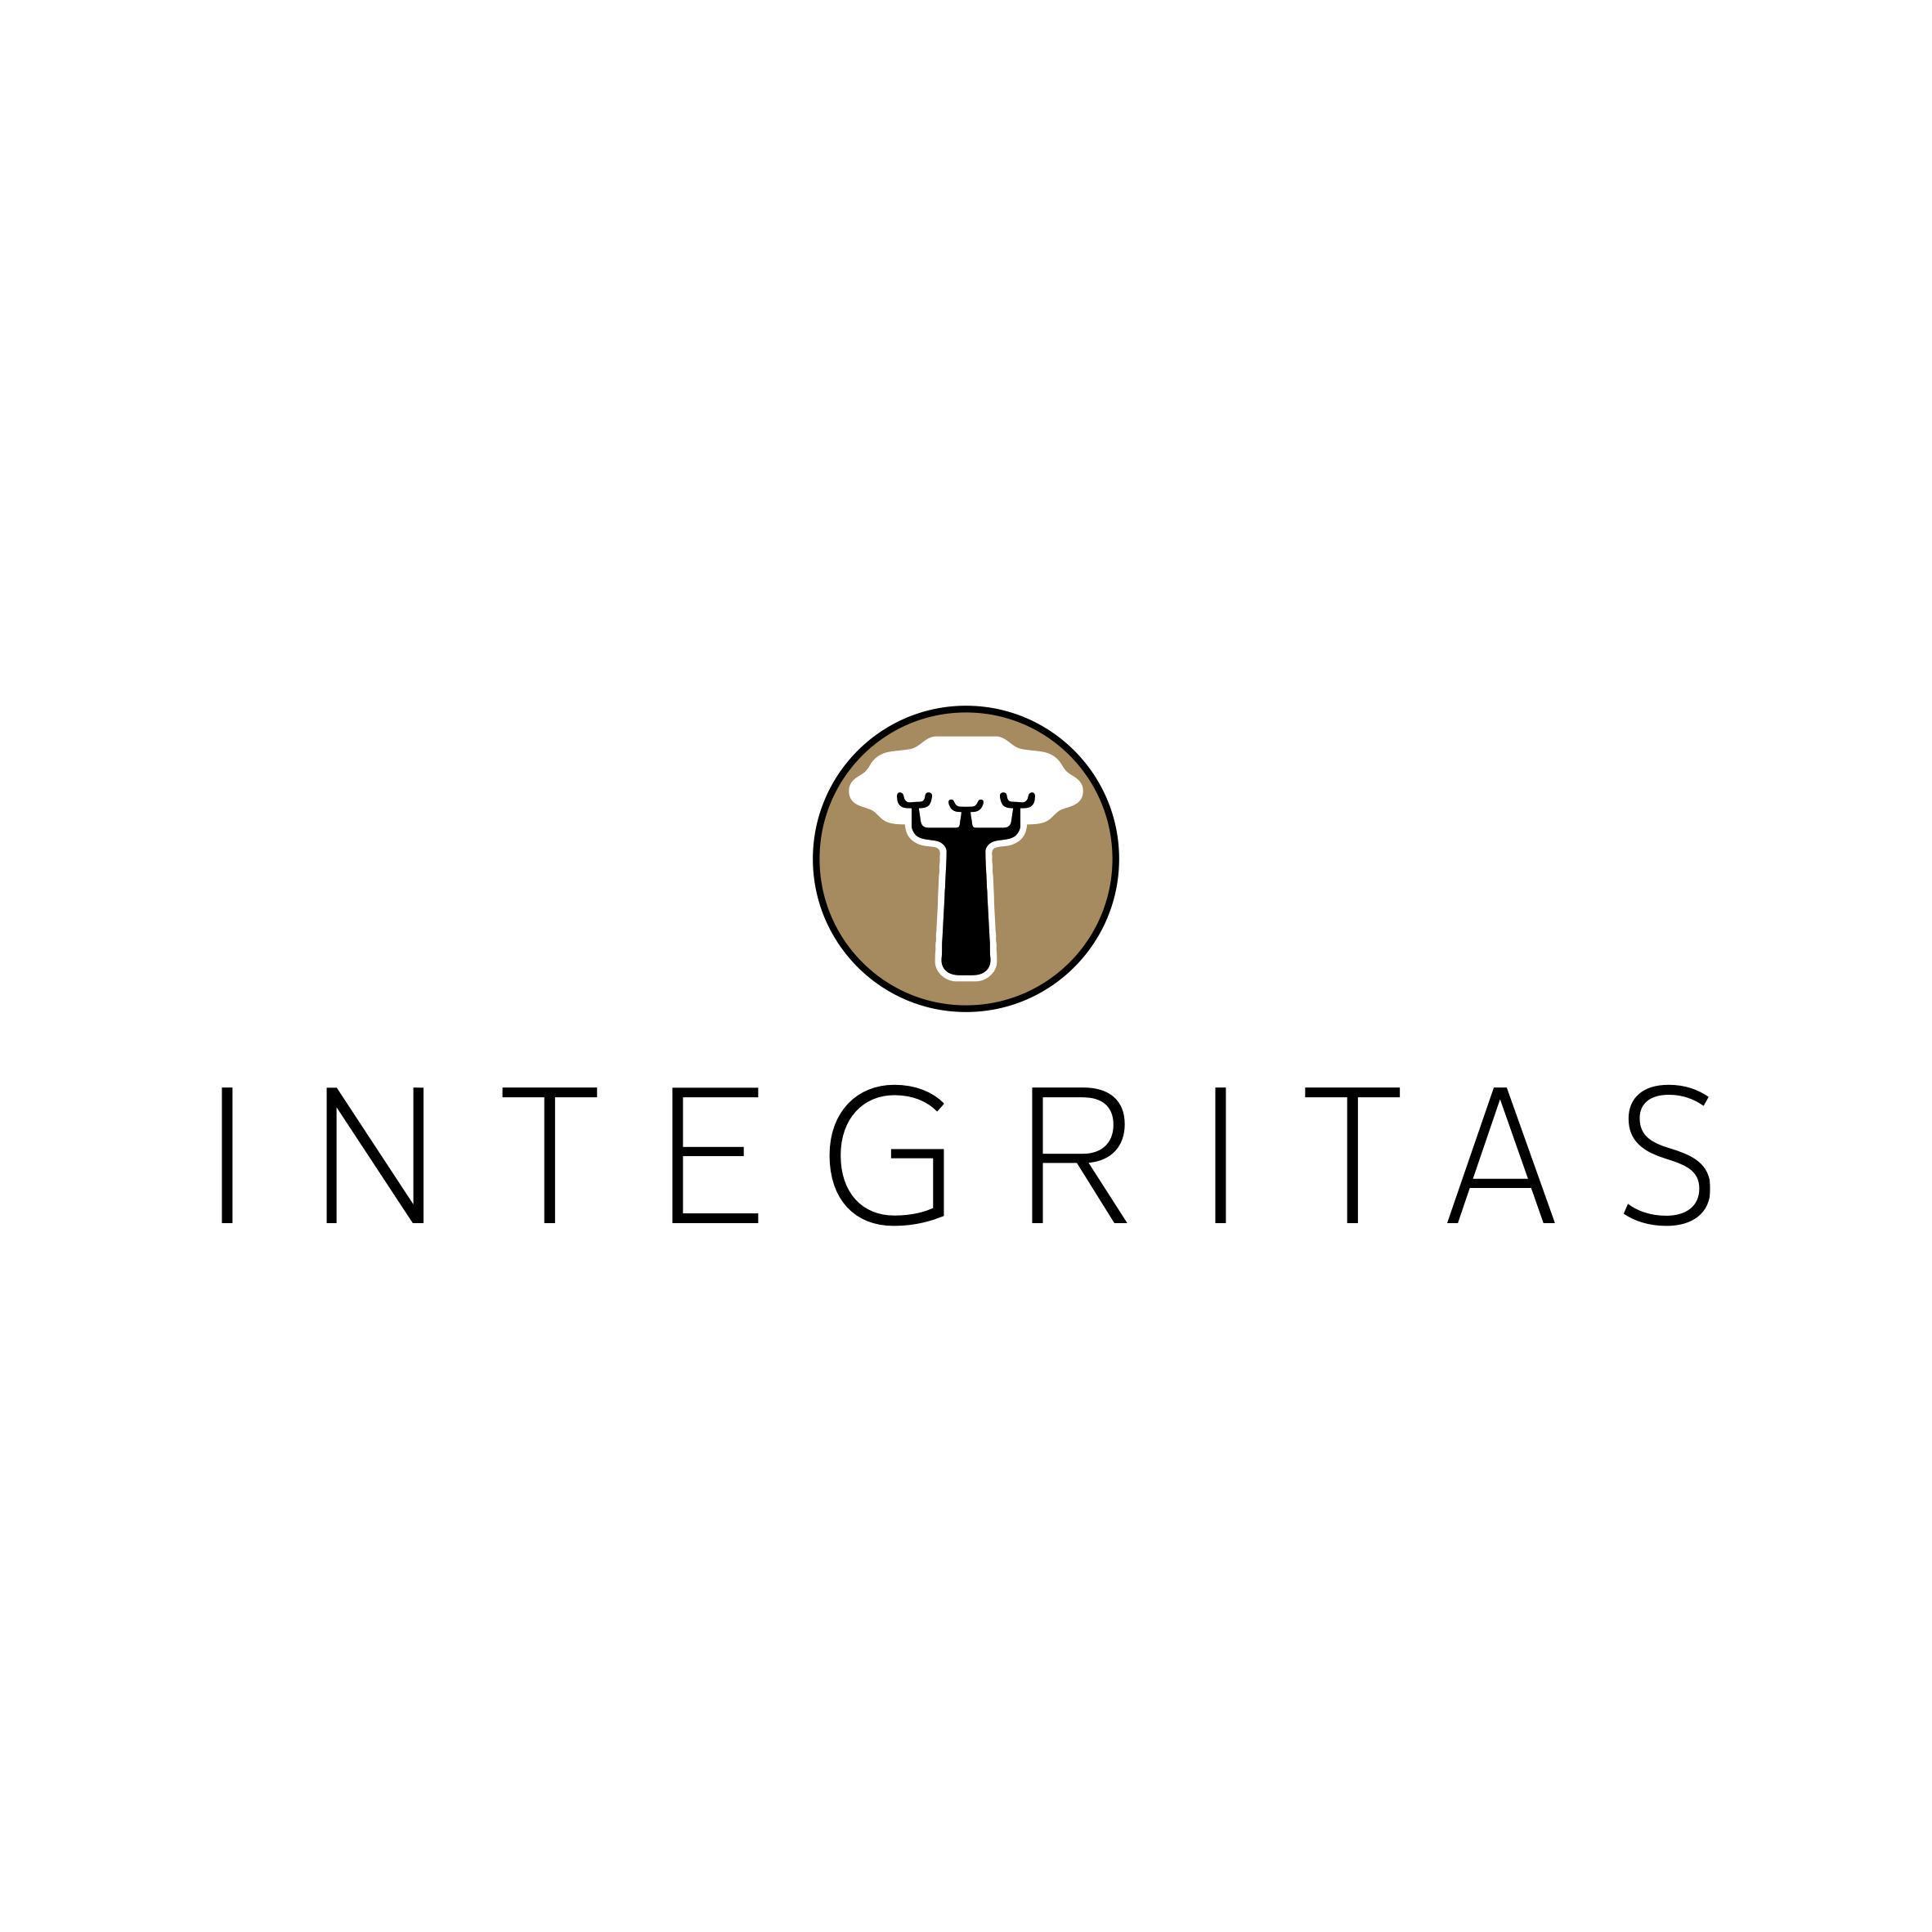 integritas-logo-ontwerp